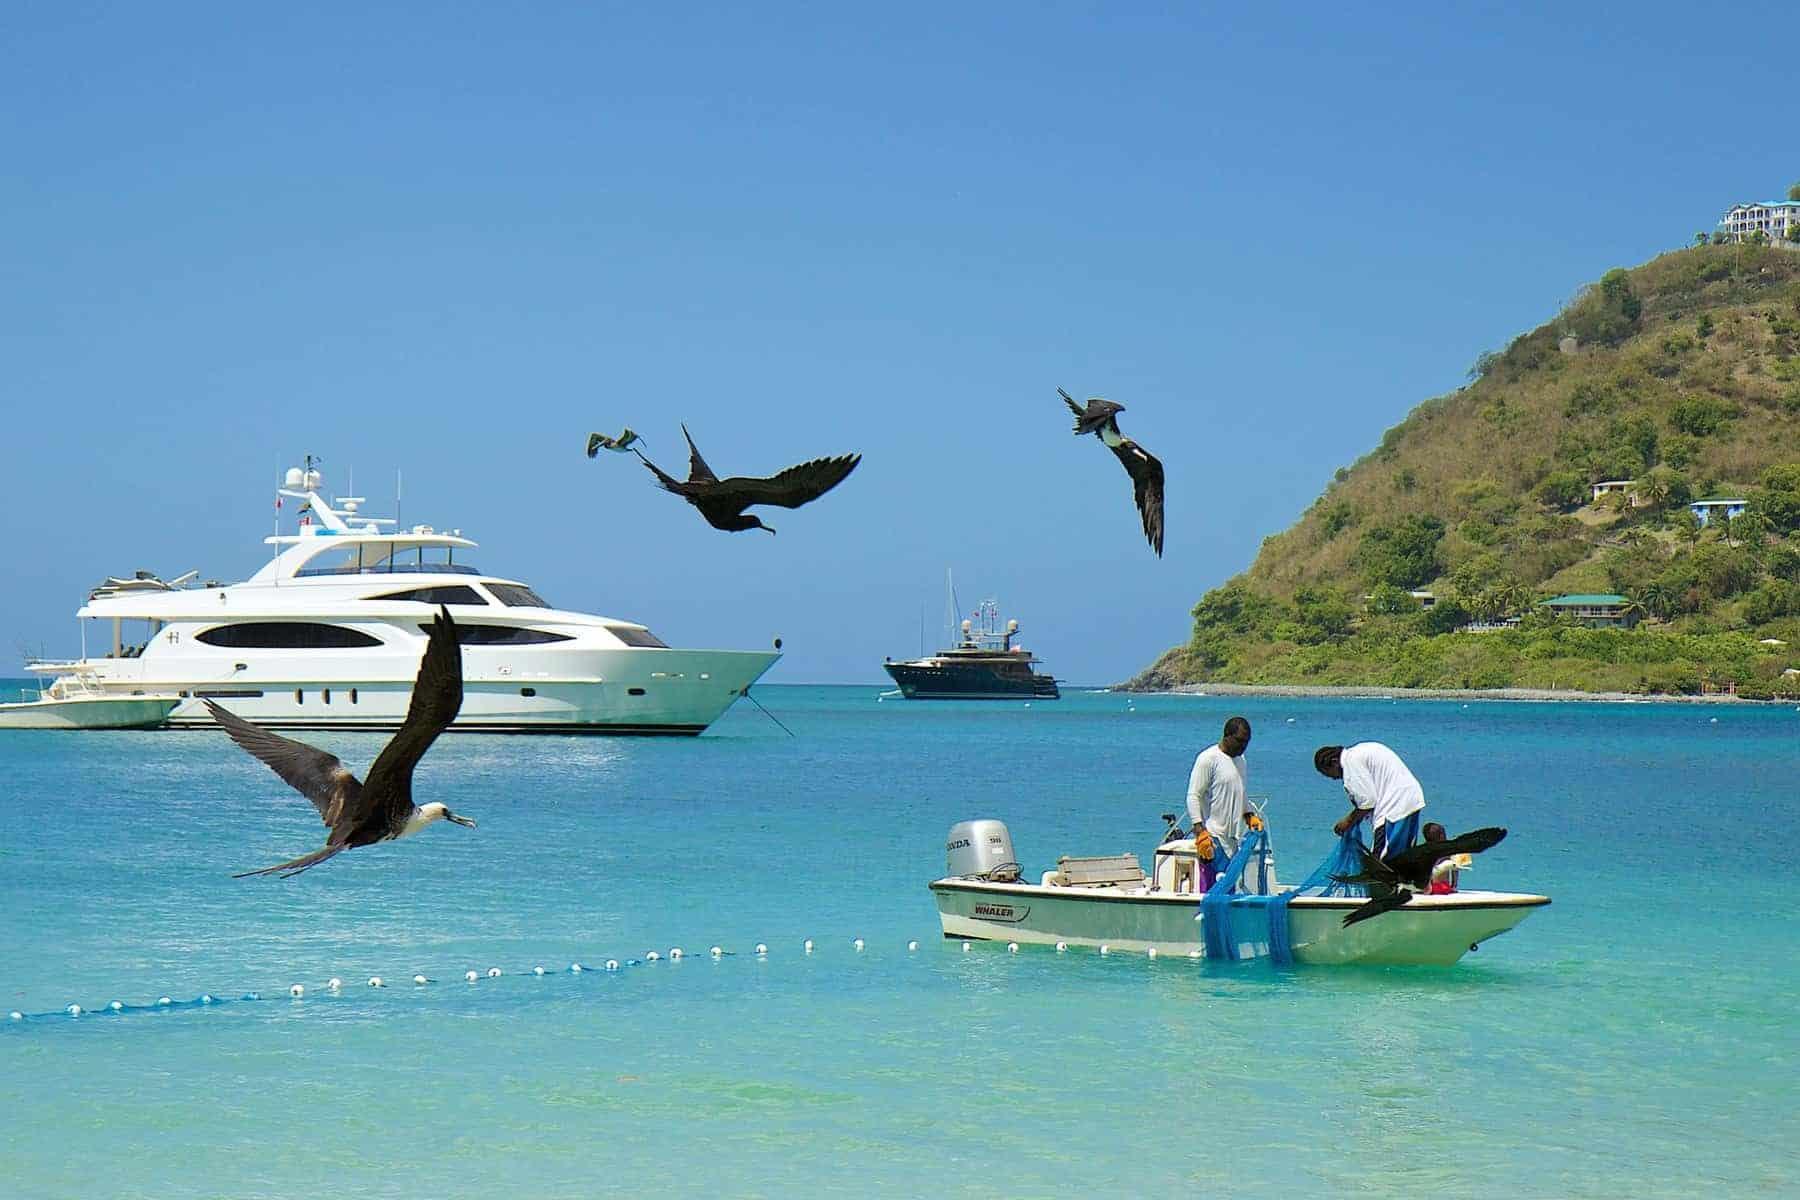 Fishermen, birds and boats in Doctor's cove bay, Tortola, British Virgin islands